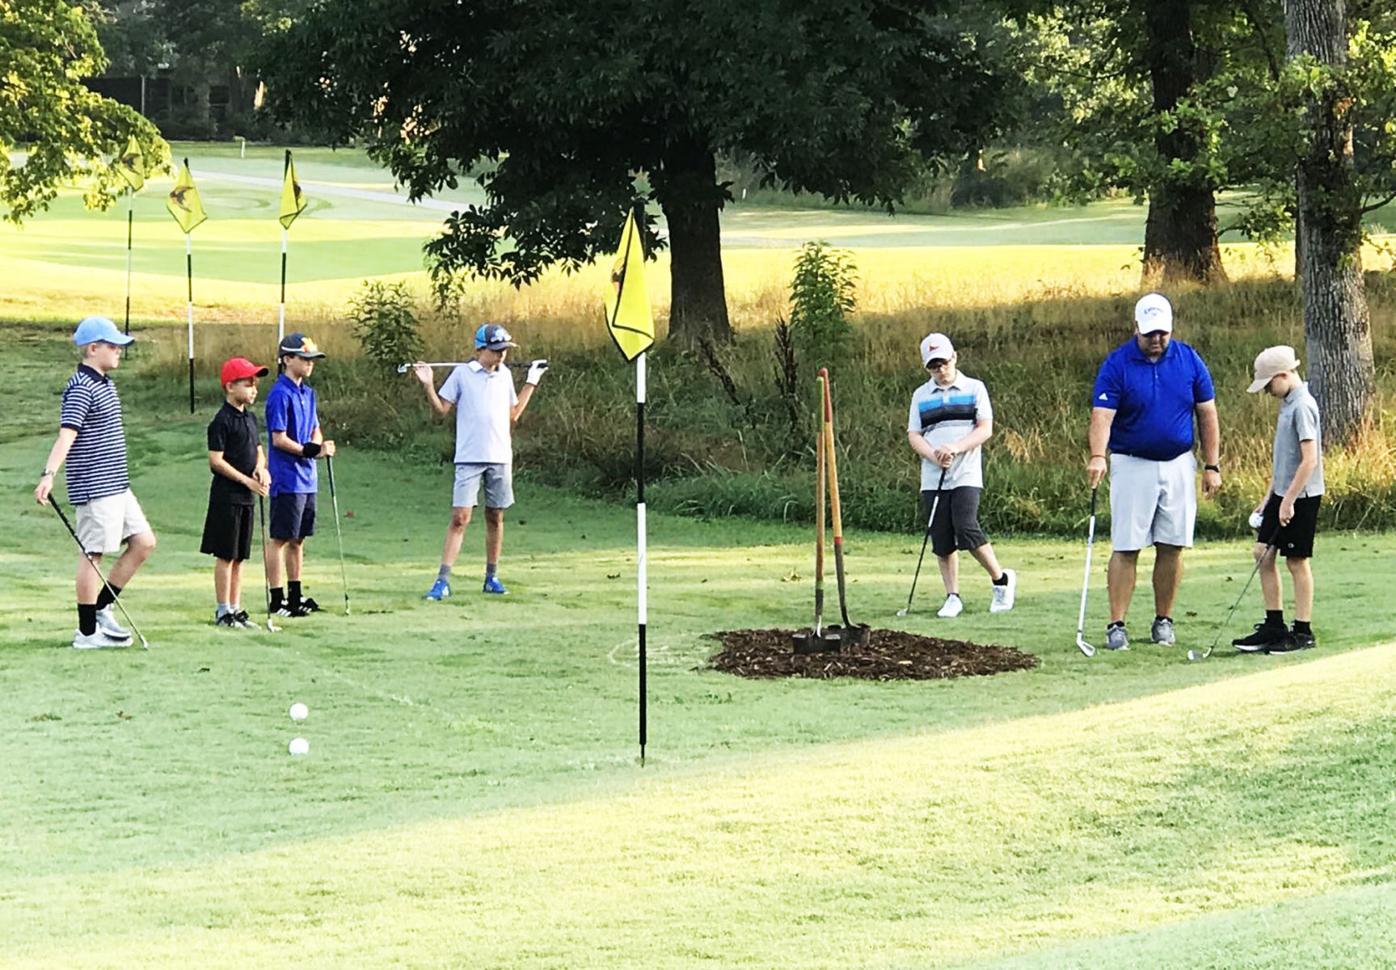 Village golf 'booming'